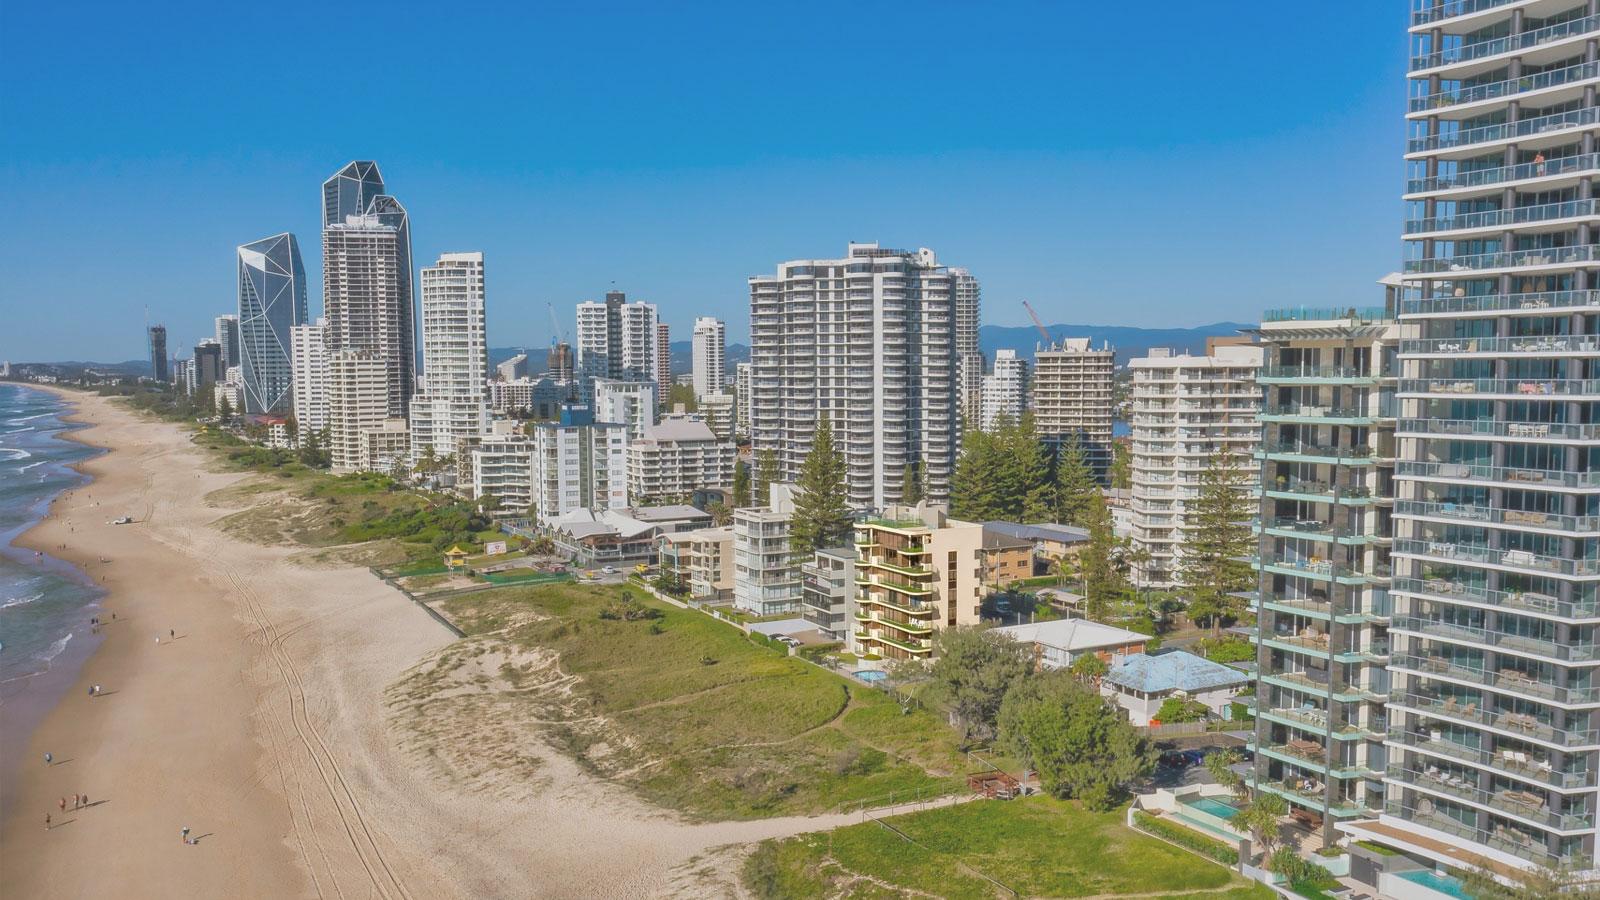 71 Garfield Terrace Gold Coast property transaction.